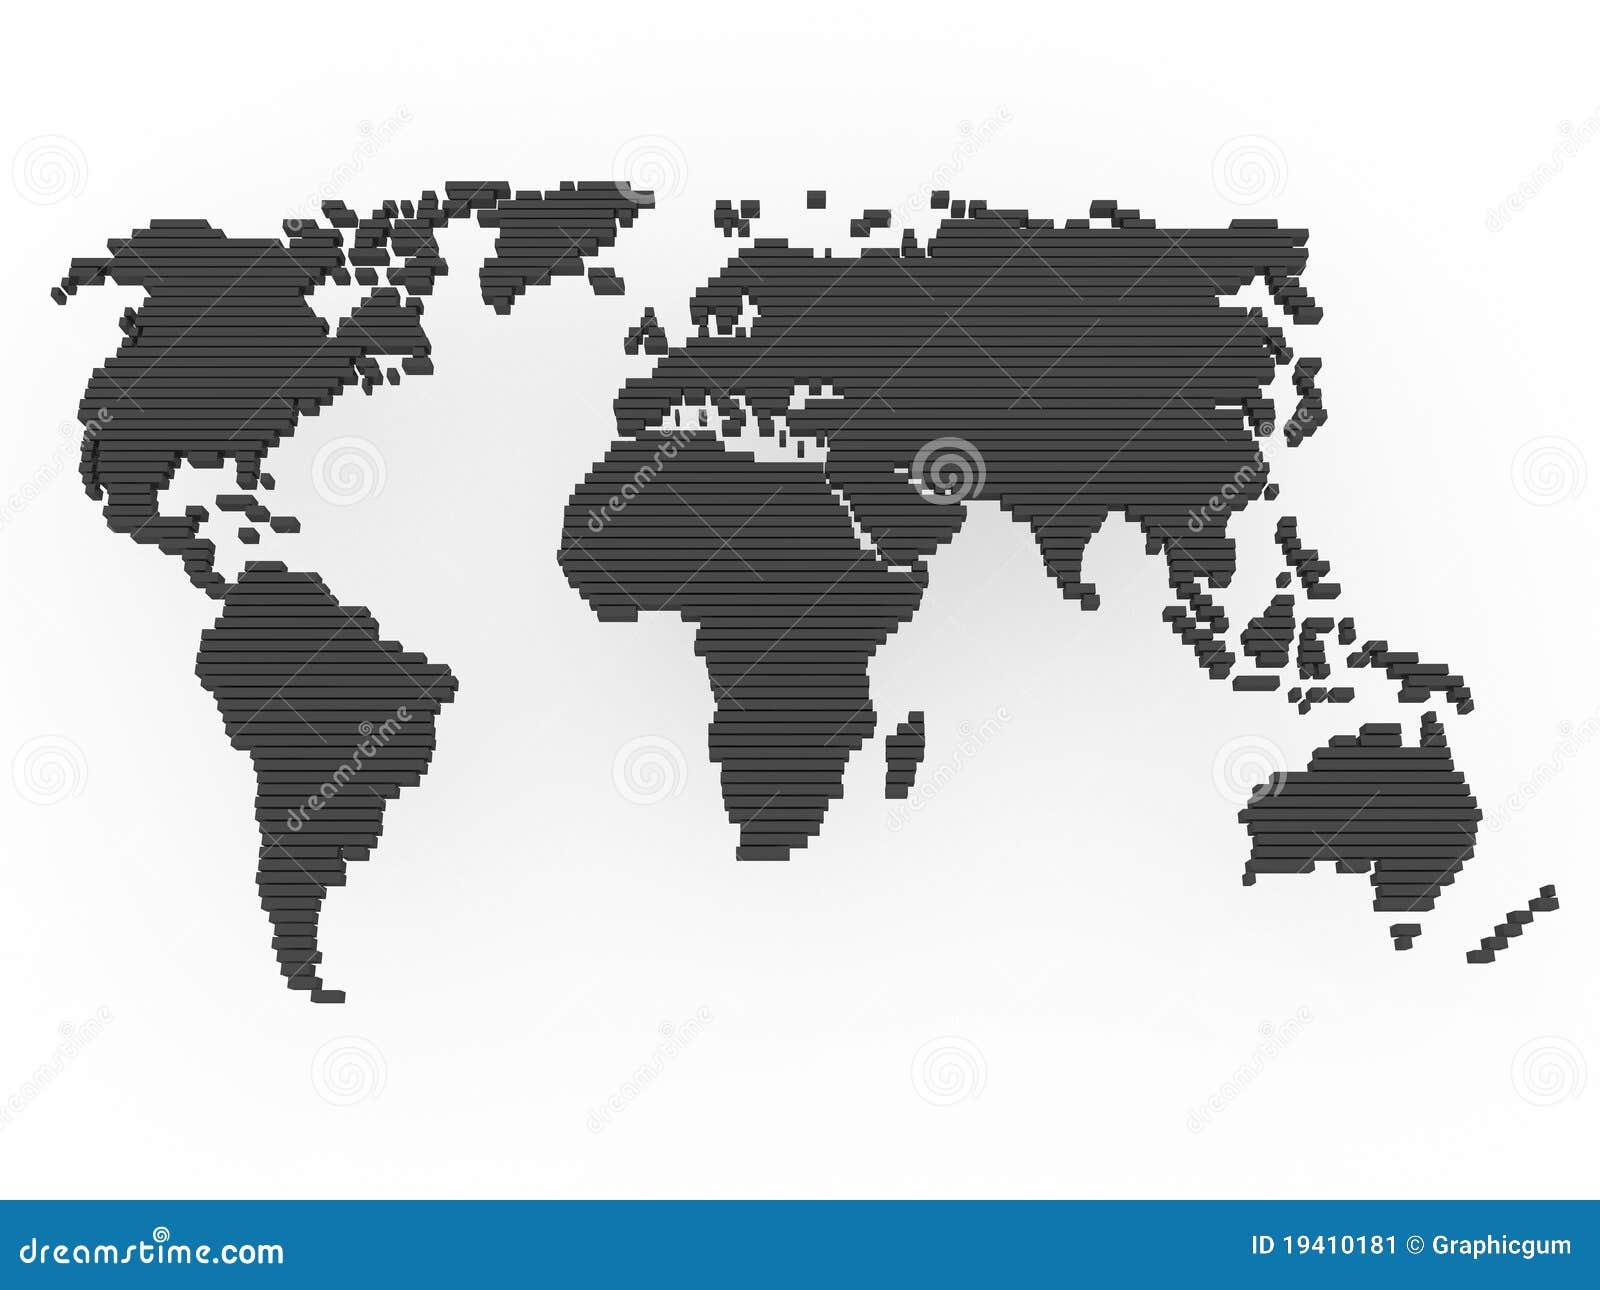 gris de noir de carte du monde illustration stock illustration du dessin abstrait 19410181. Black Bedroom Furniture Sets. Home Design Ideas